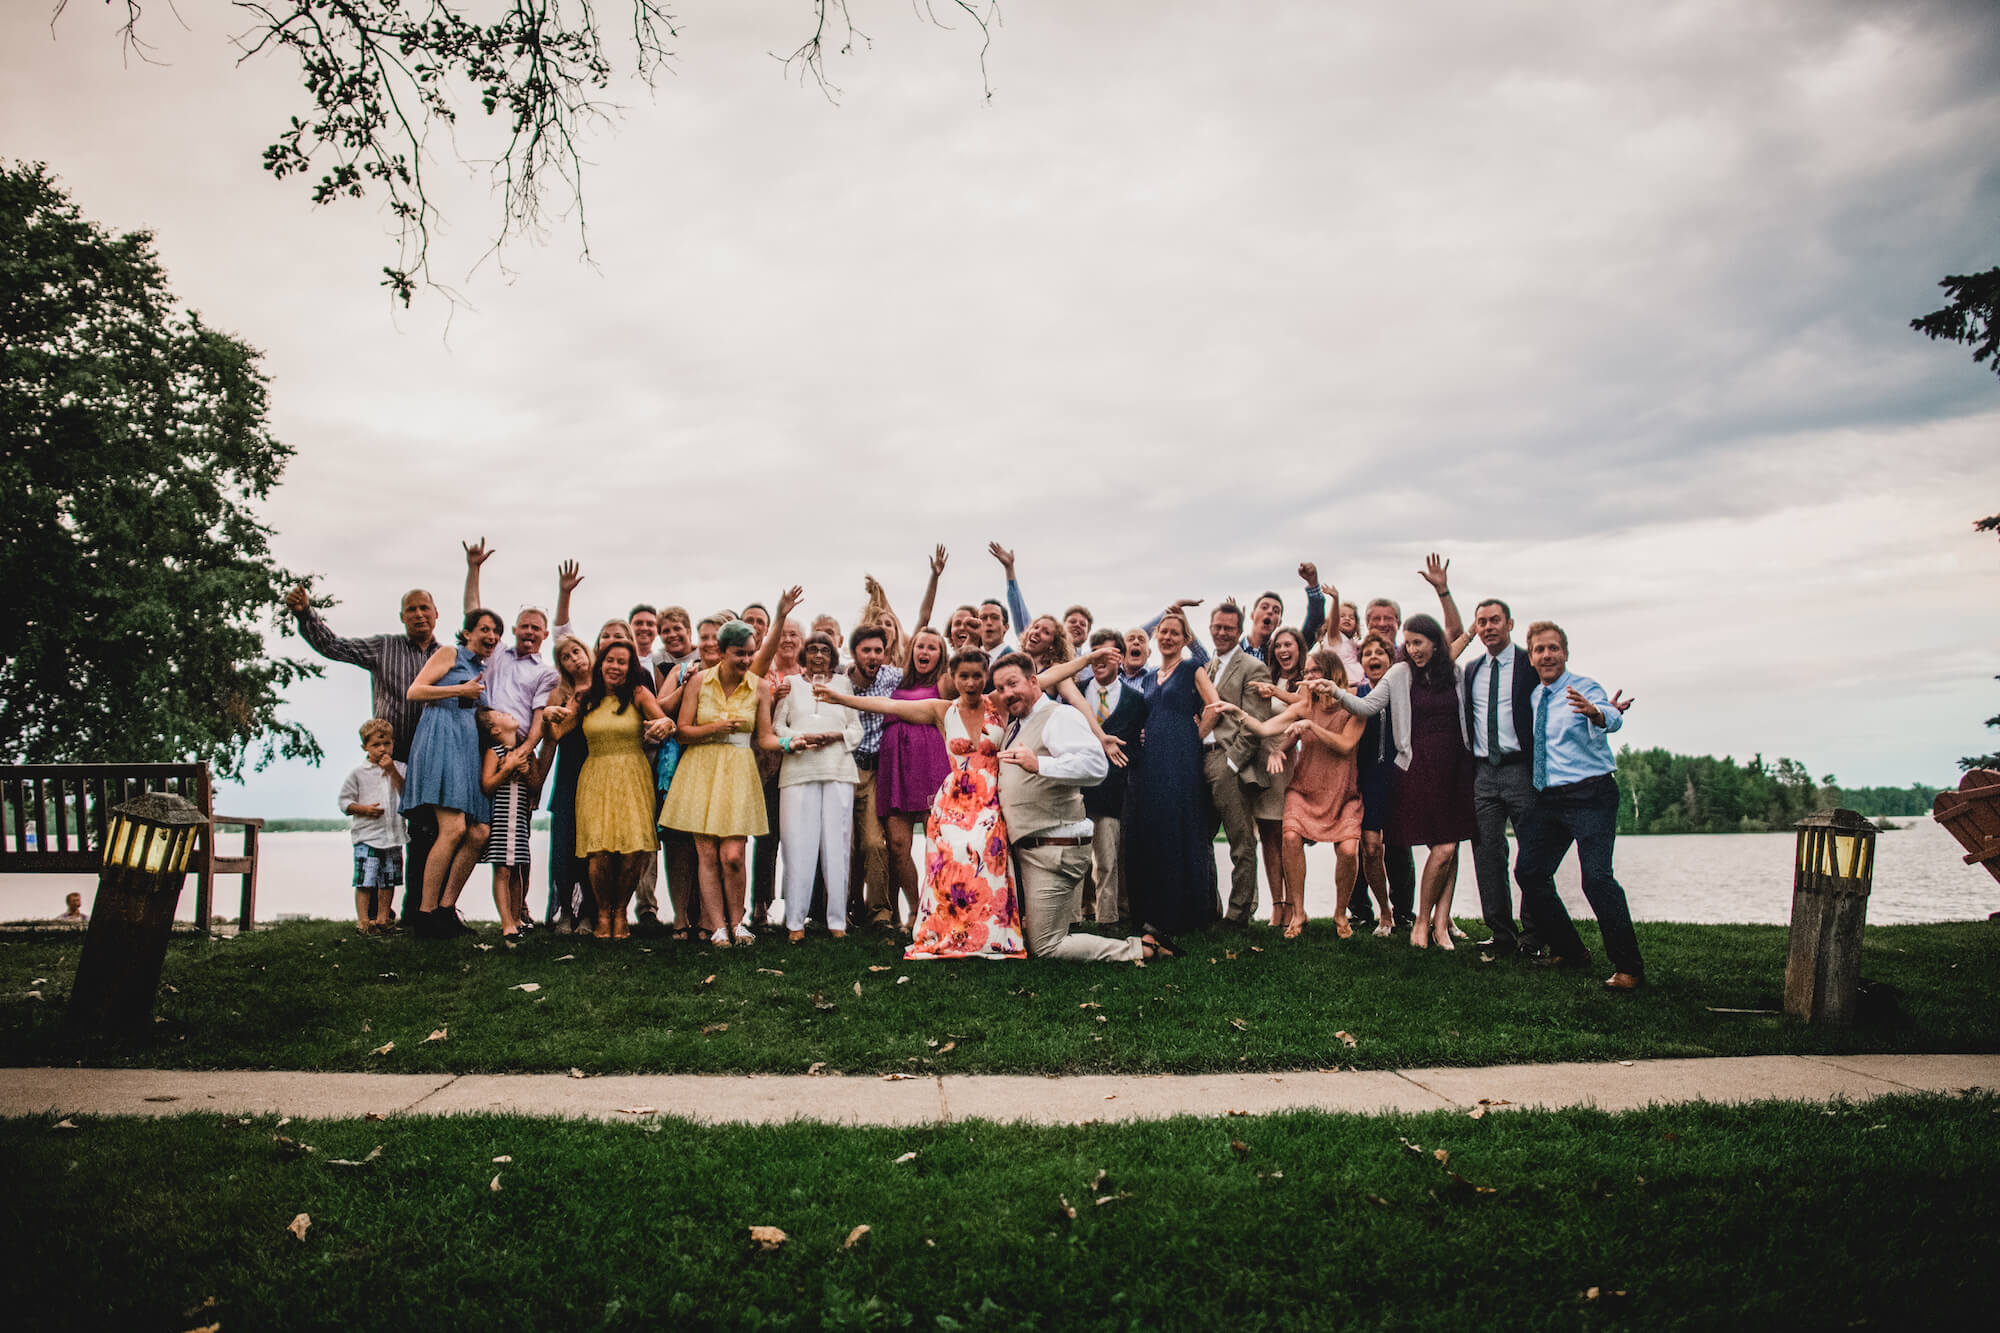 engle-olson-maddy-pat-mn-wedding-photography-62.jpg